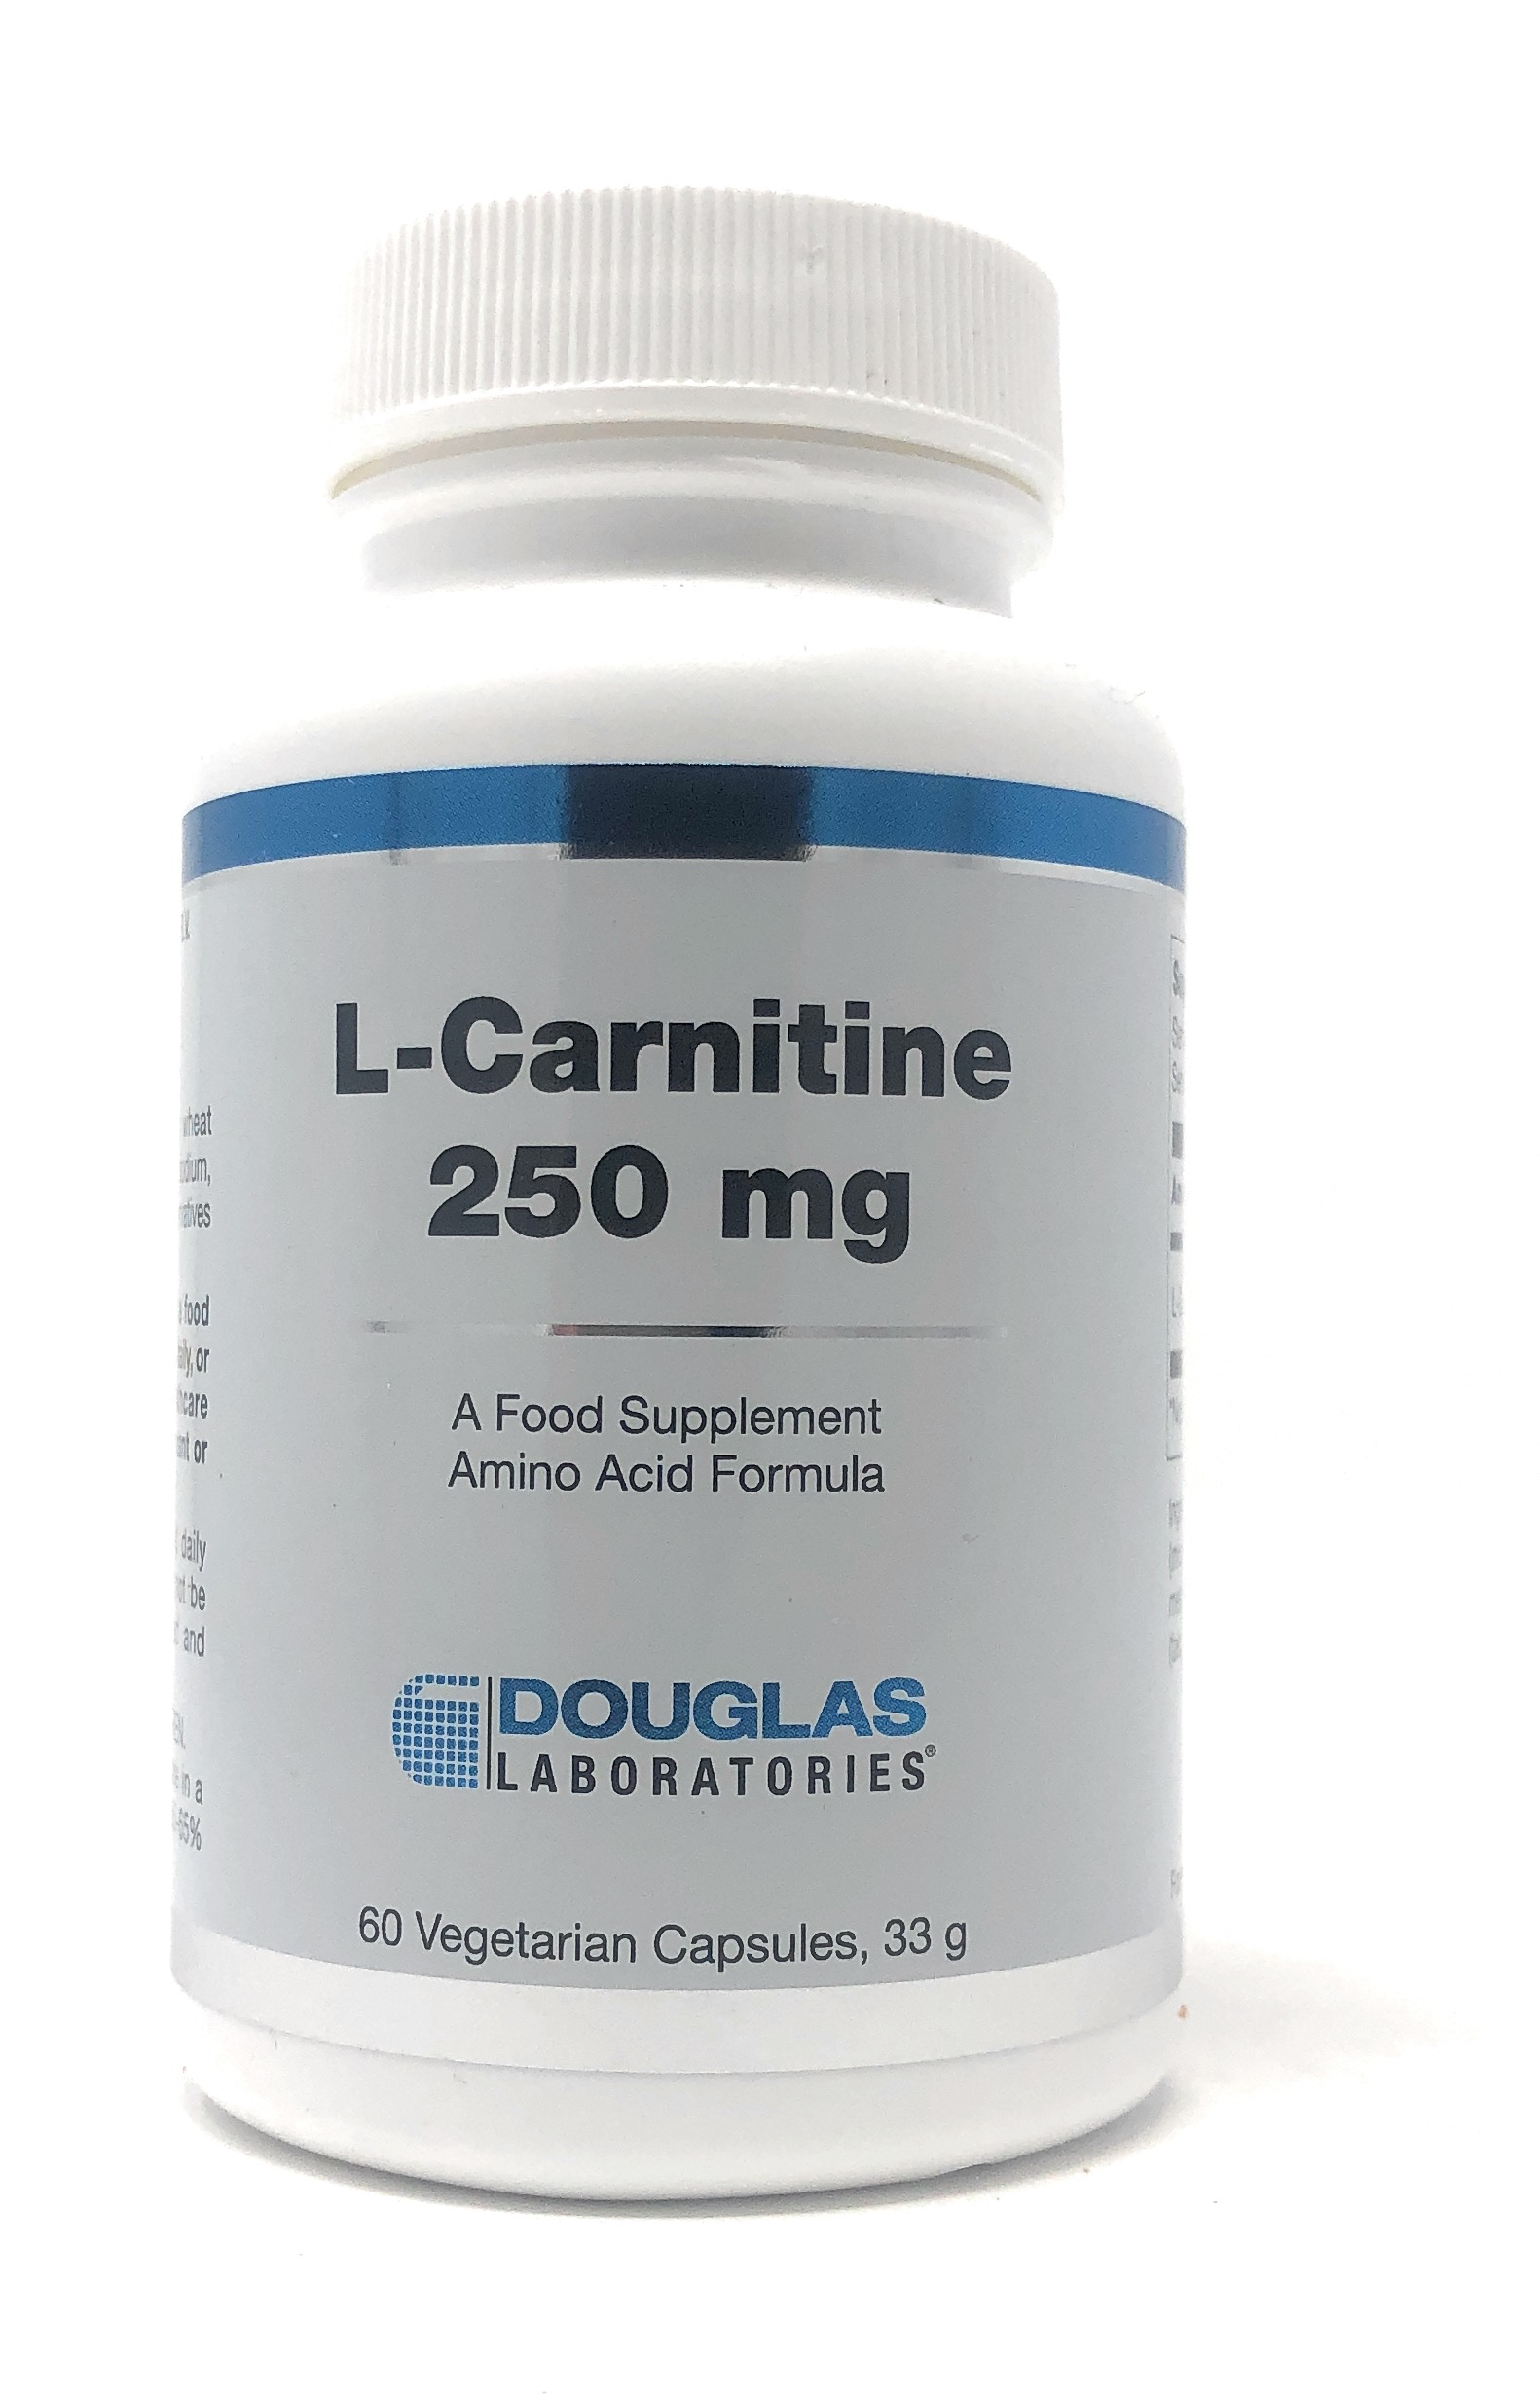 Douglas Laboratories Europe L-Carnitine 250 mg 60 Kapseln (33g)(vegan)